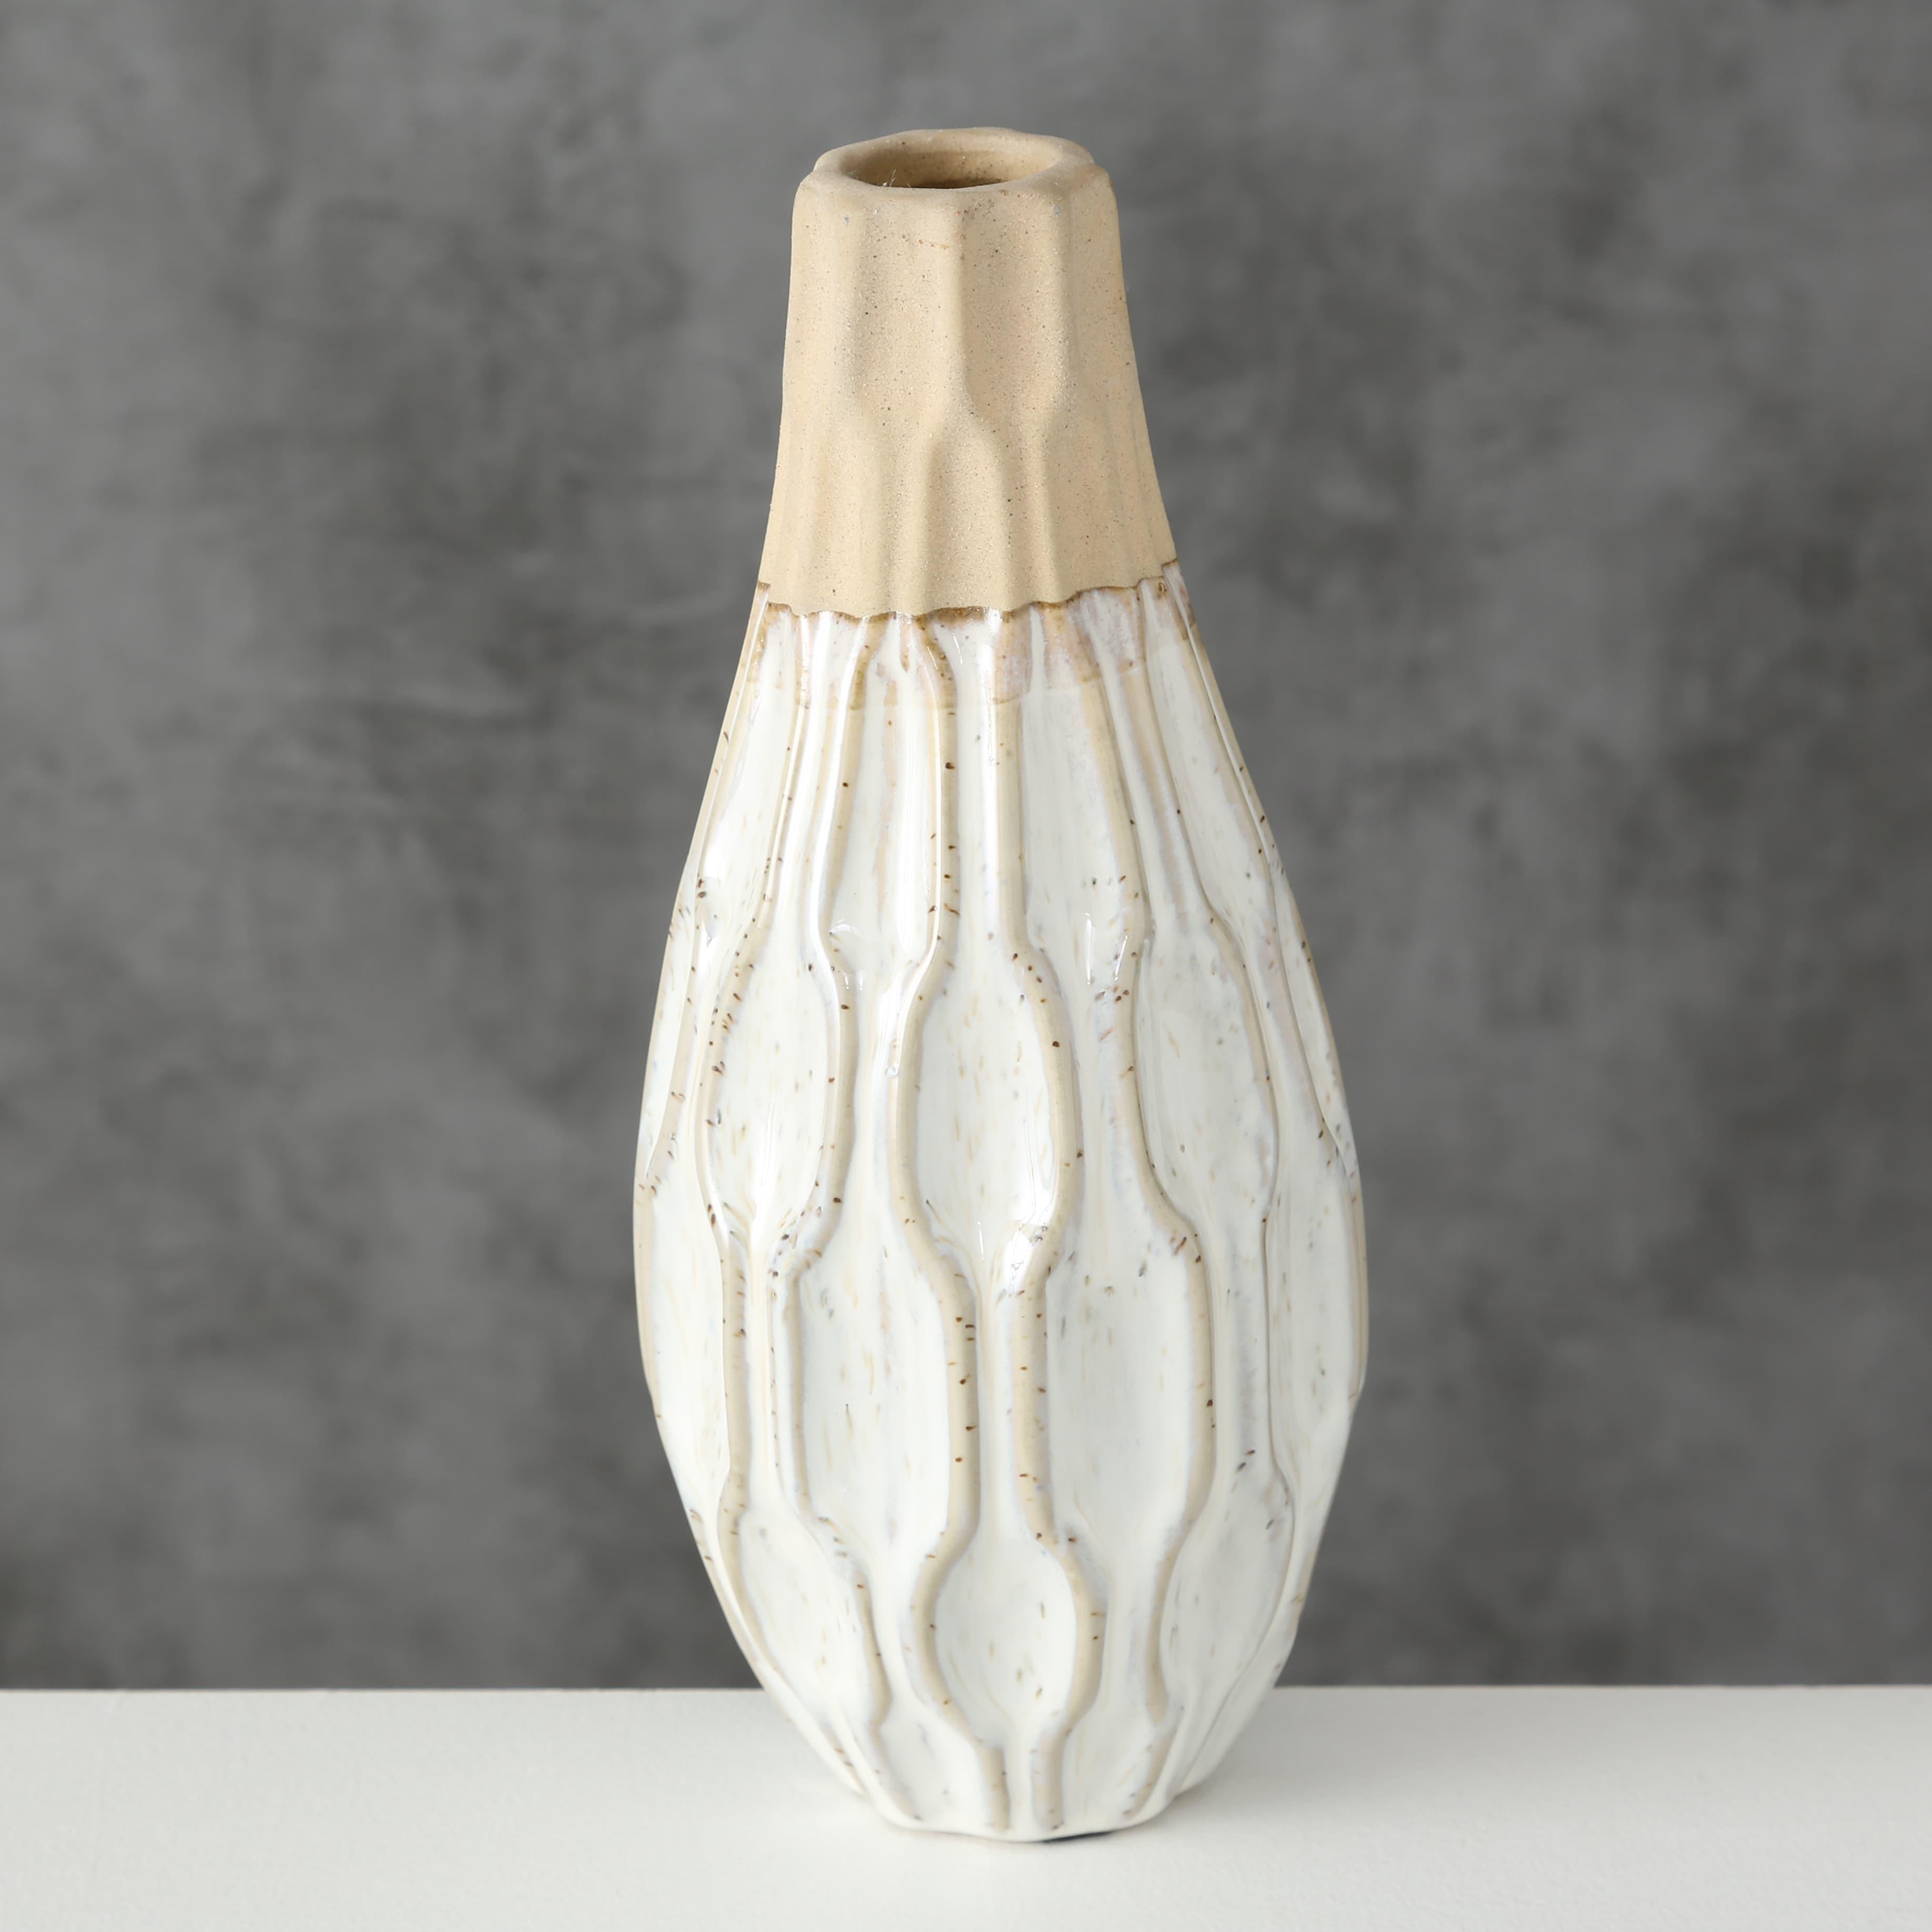 Vaza decorativa din ceramica Malia Crem / Bej, Ø10xH25 cm poza